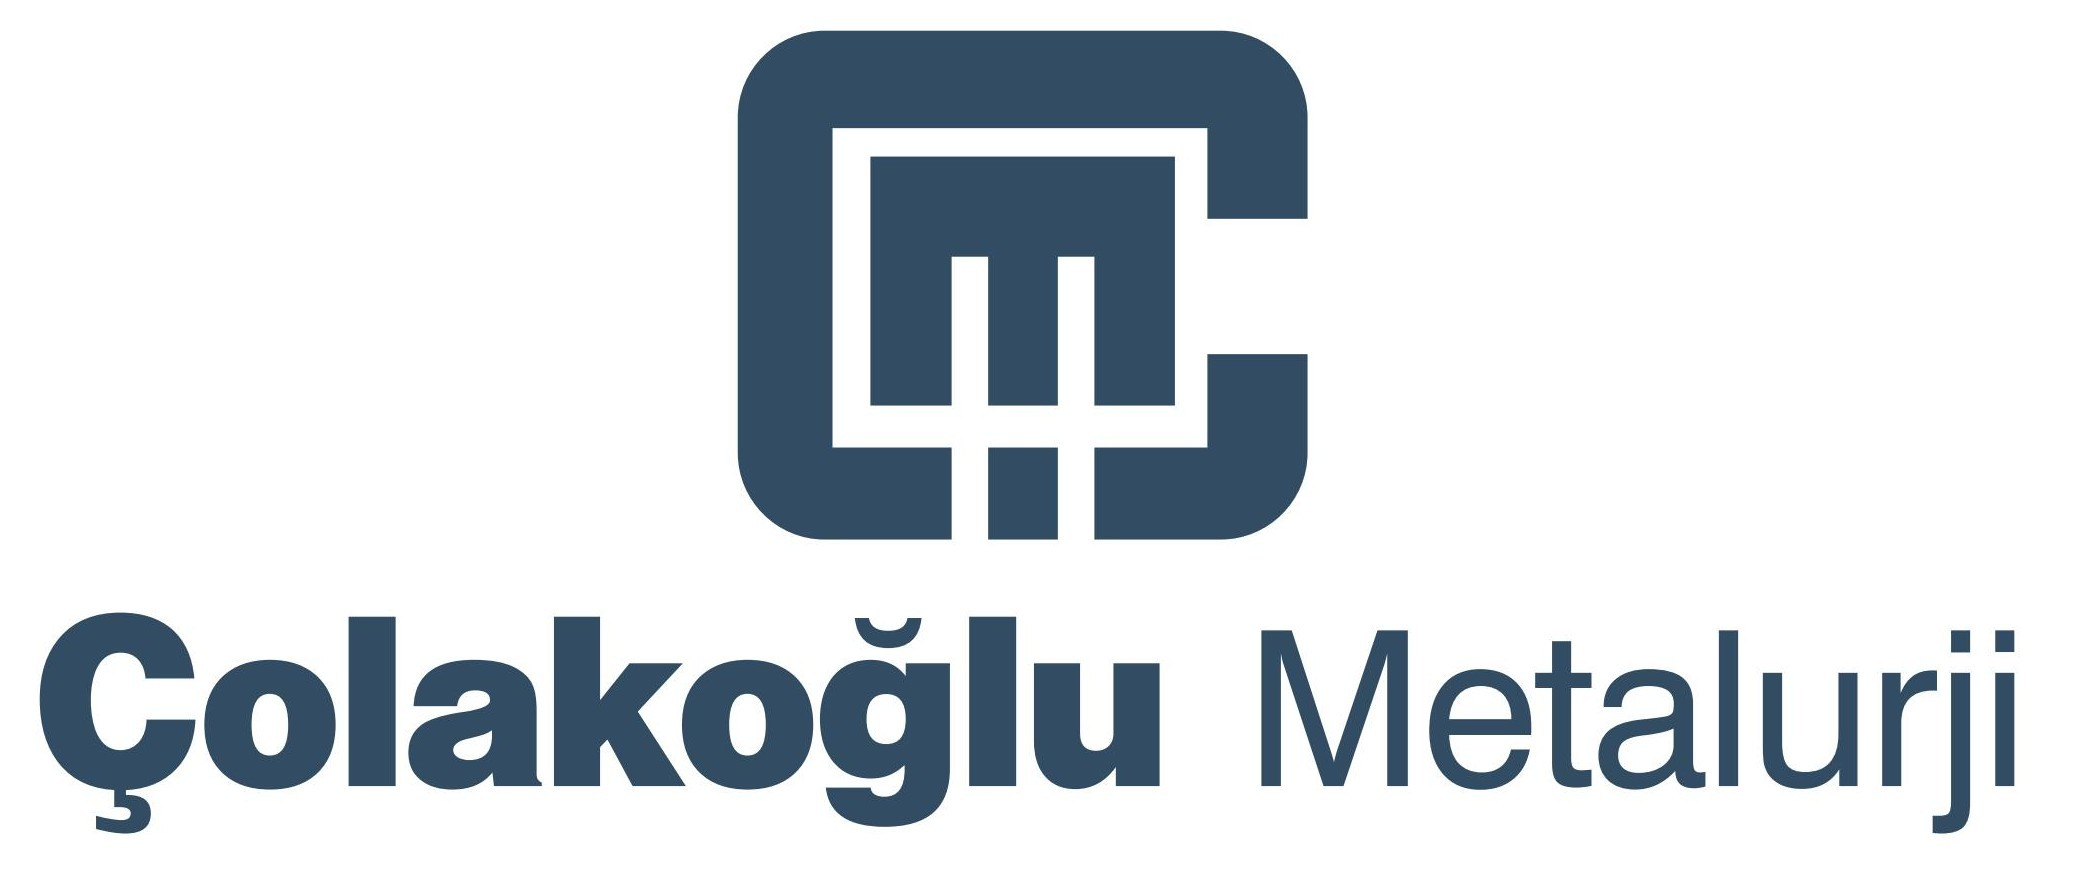 Çolakoğlu Metalurji A.Ş. Vektörel Logosu [EPS File] png